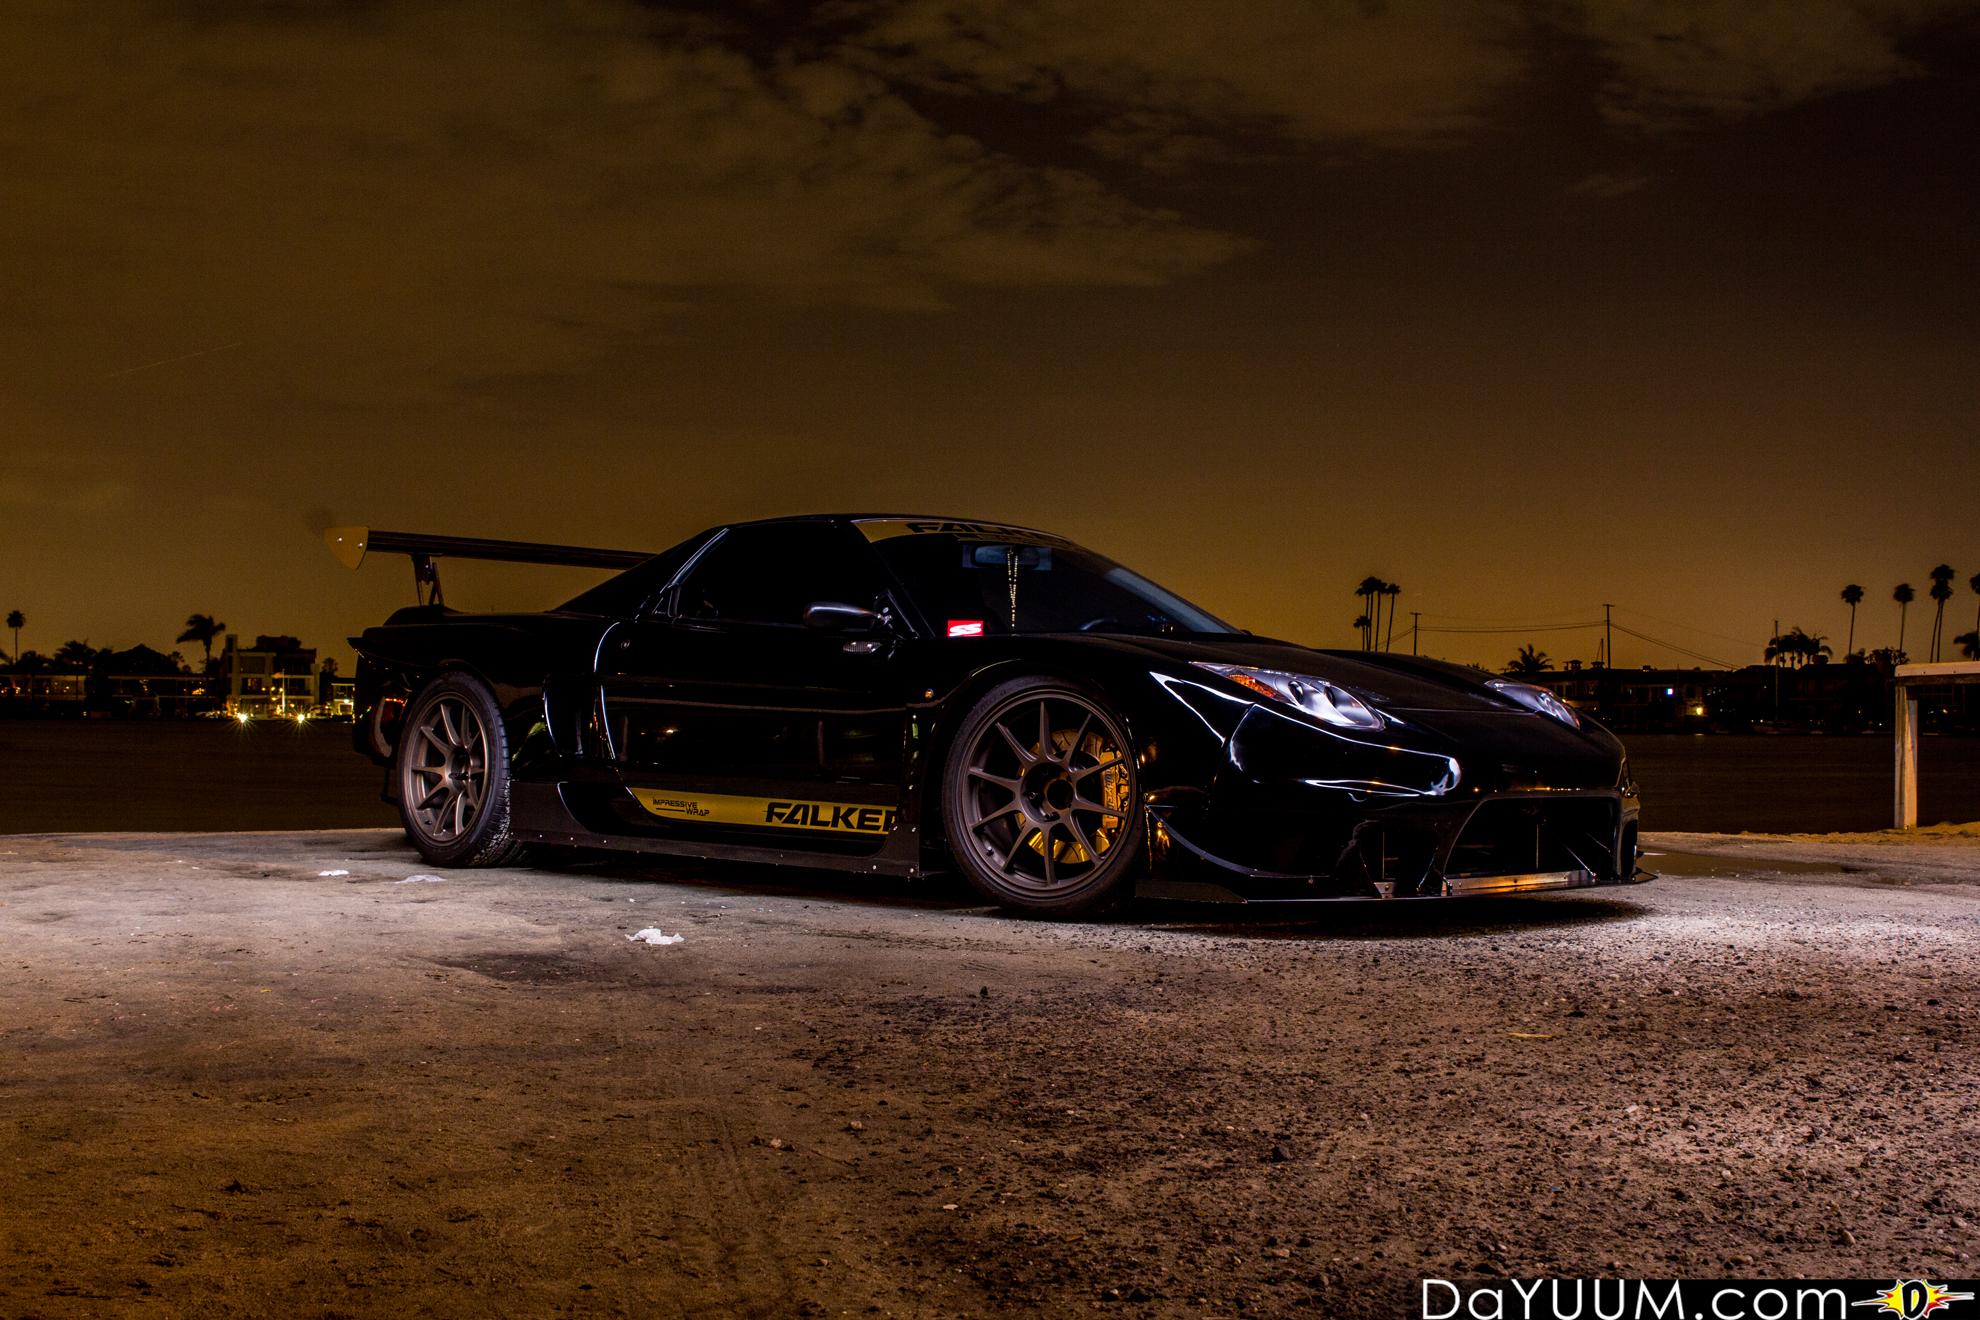 Leon_NSX-9115.jpg